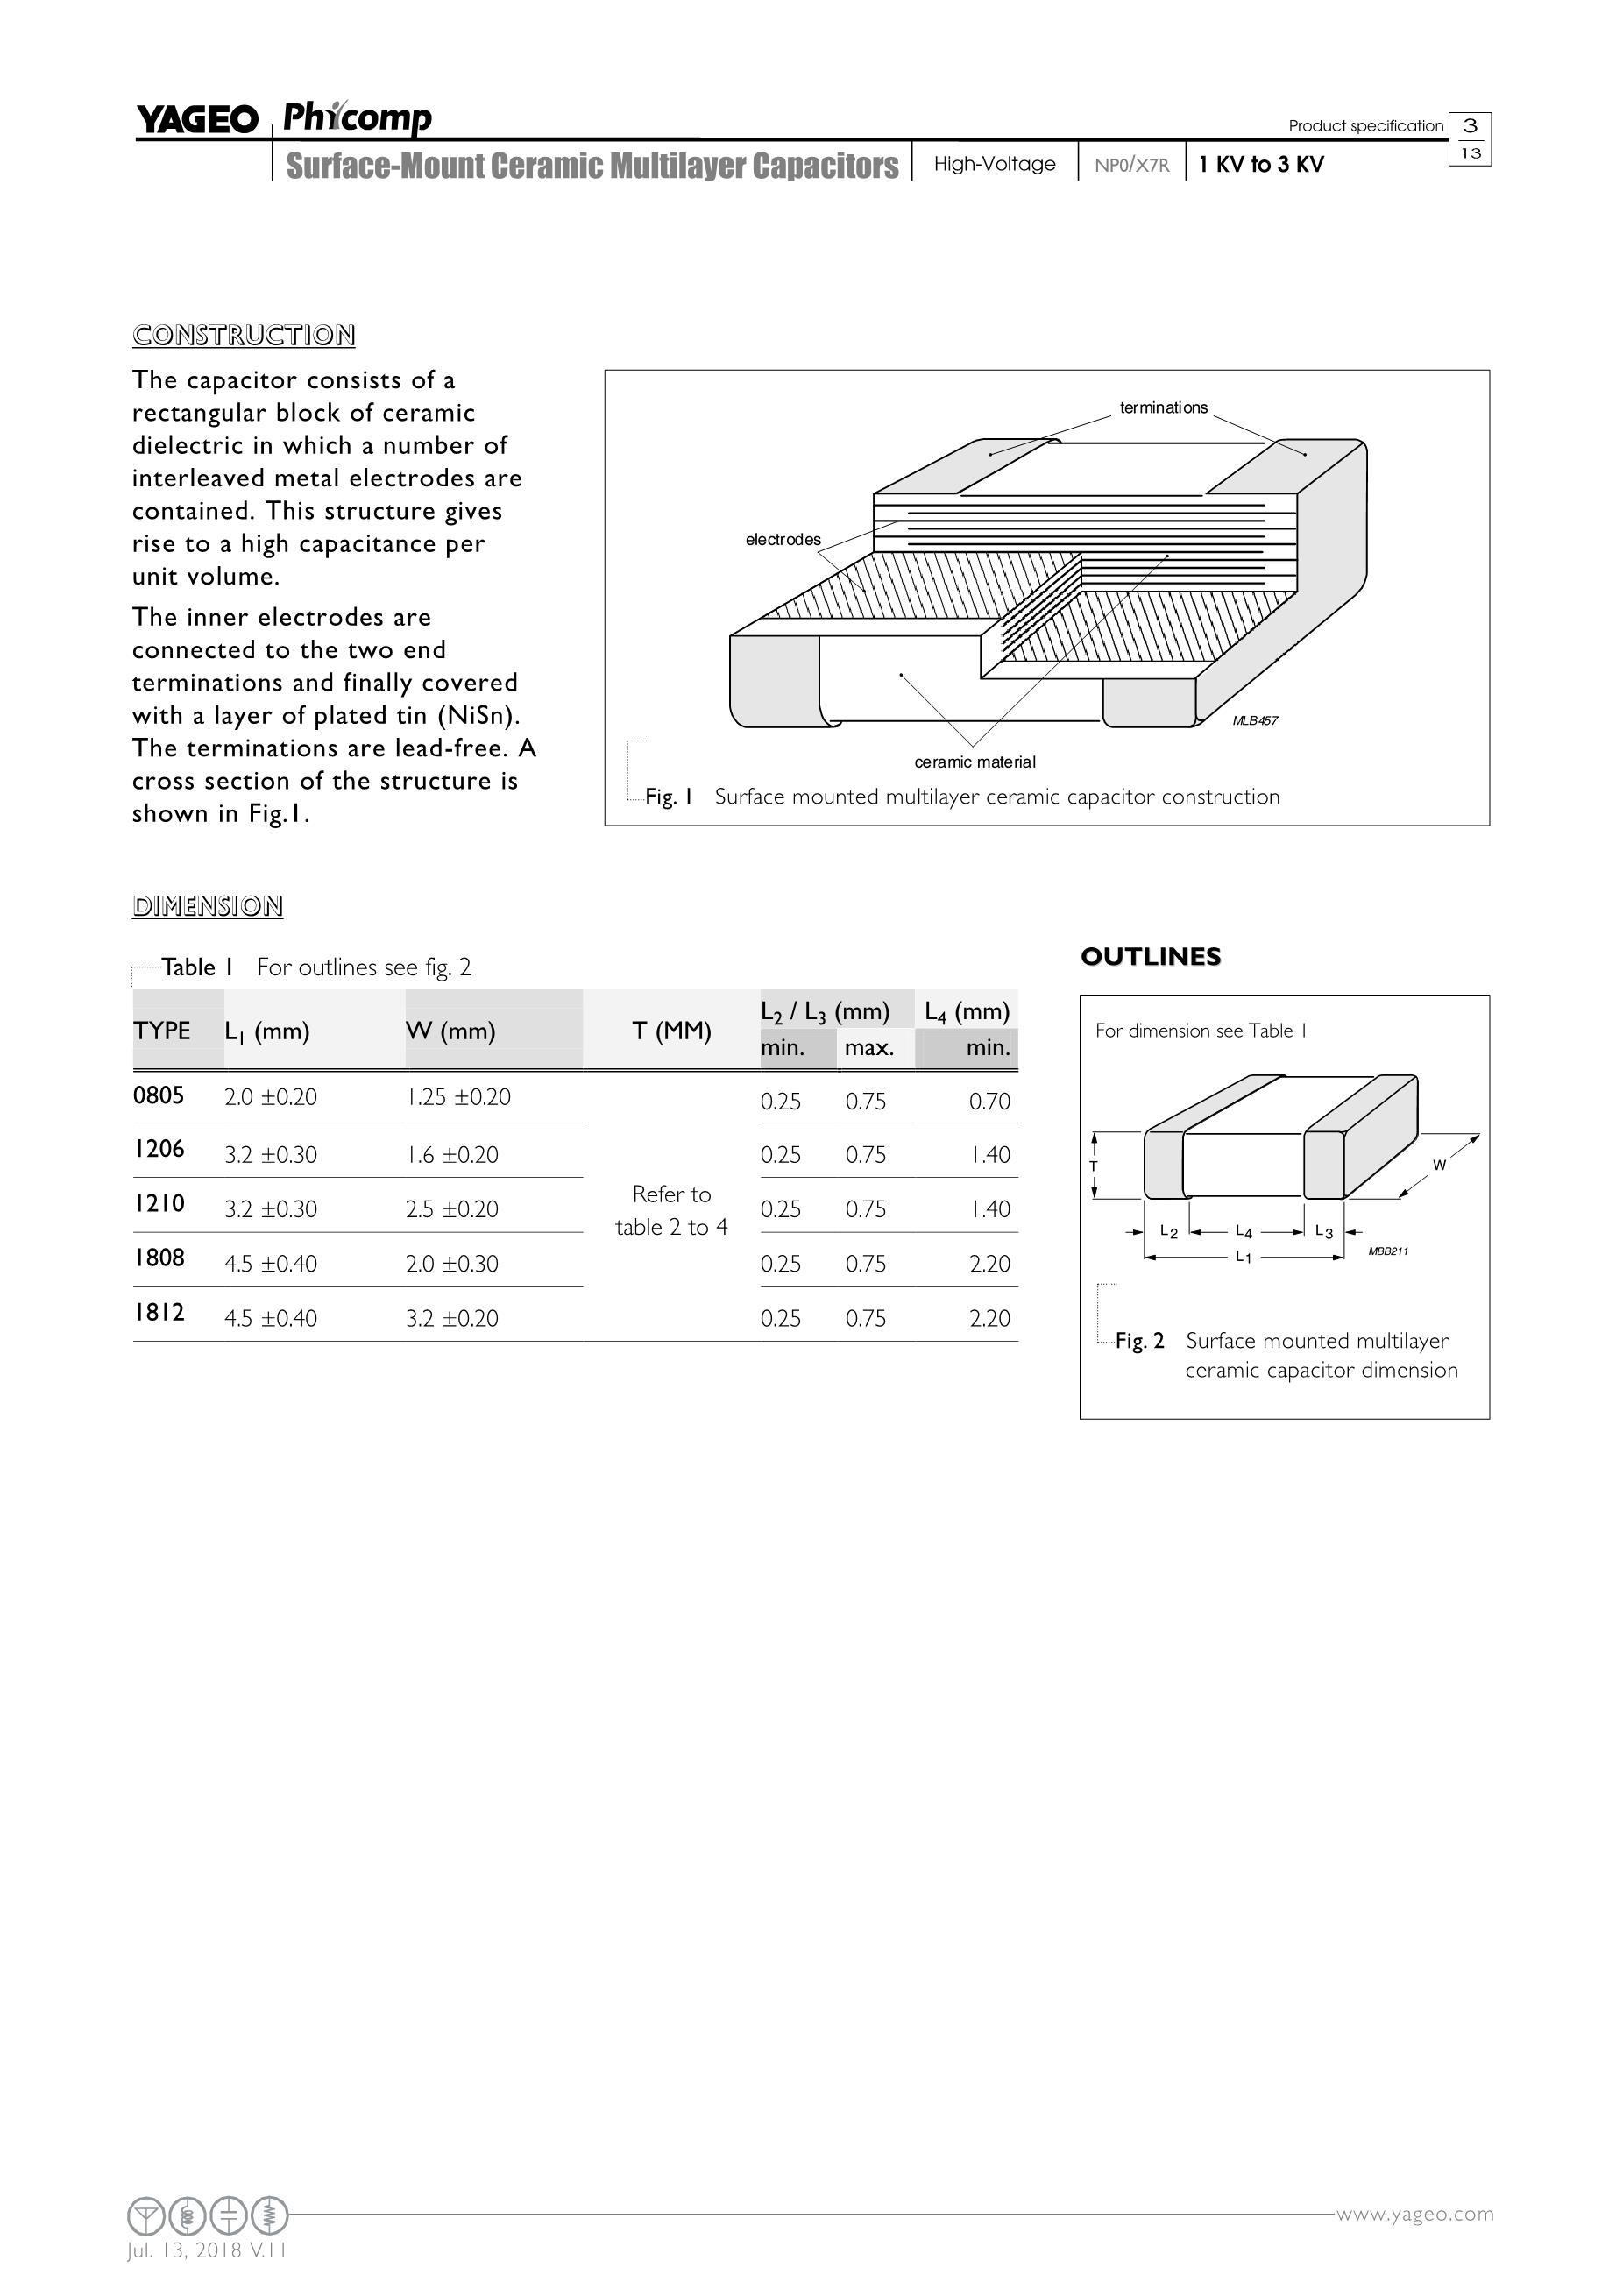 1808102K/1KV's pdf picture 3